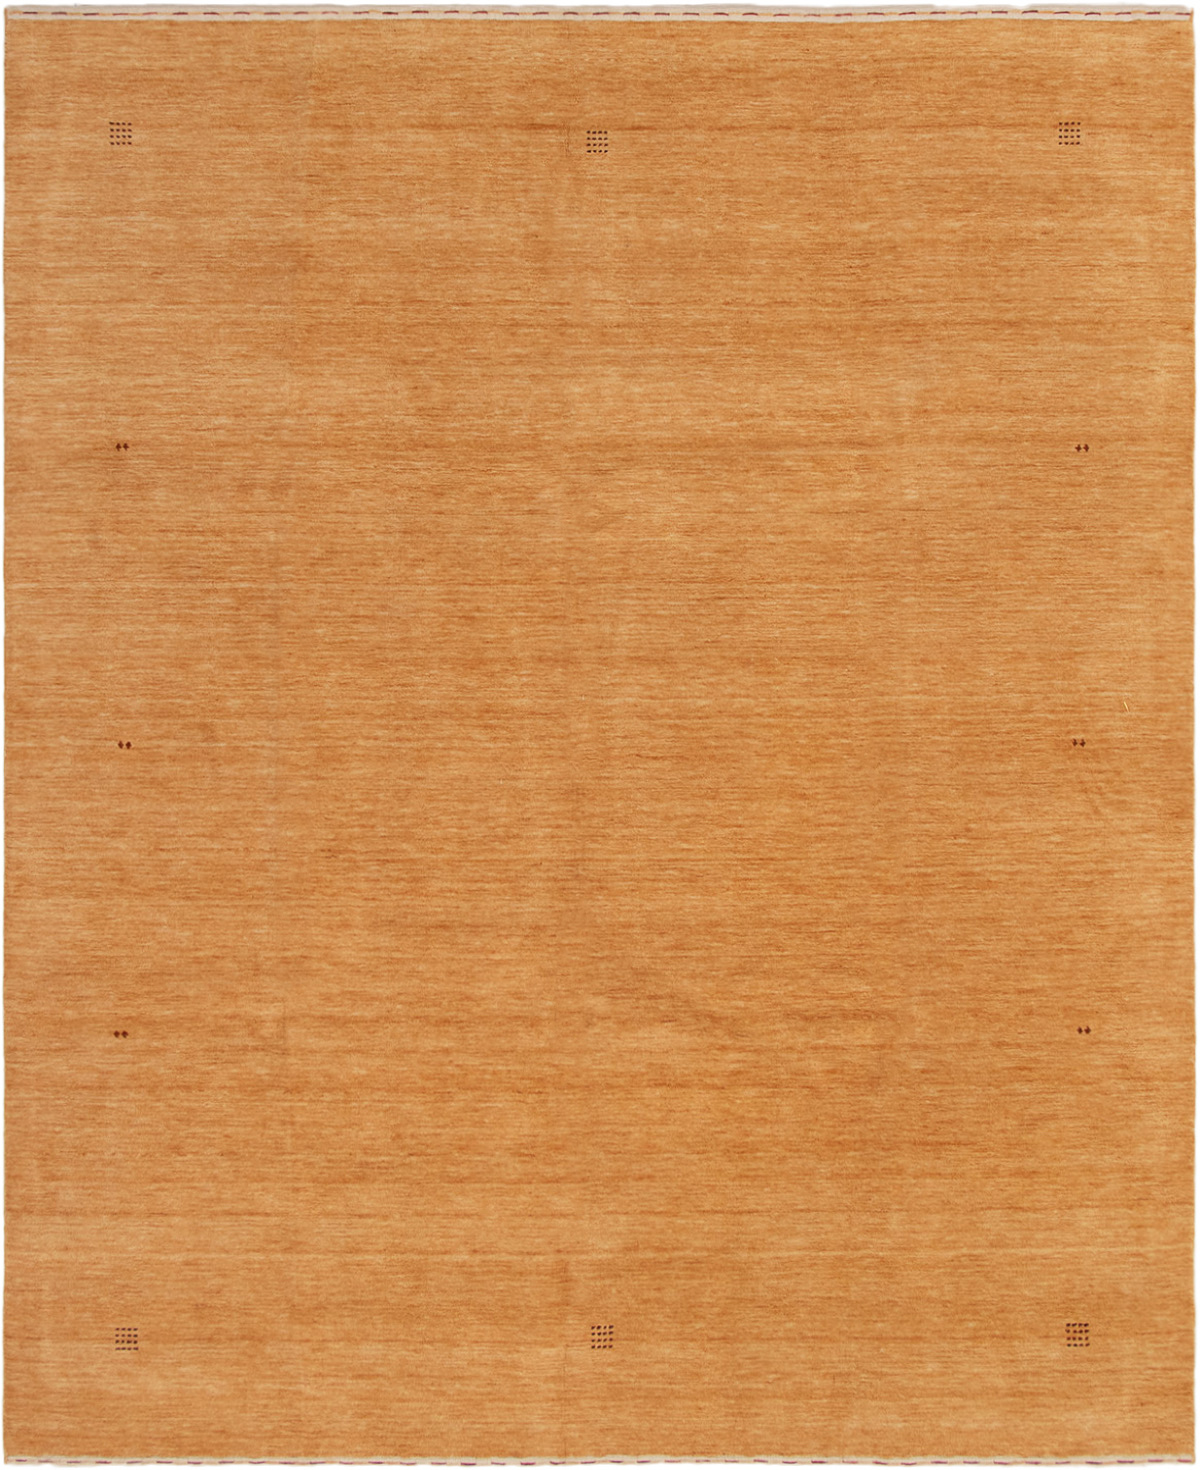 "Hand-knotted Kashkuli Gabbeh Light Orange Wool Rug 8'2"" x 9'10""  Size: 8'2"" x 9'10"""